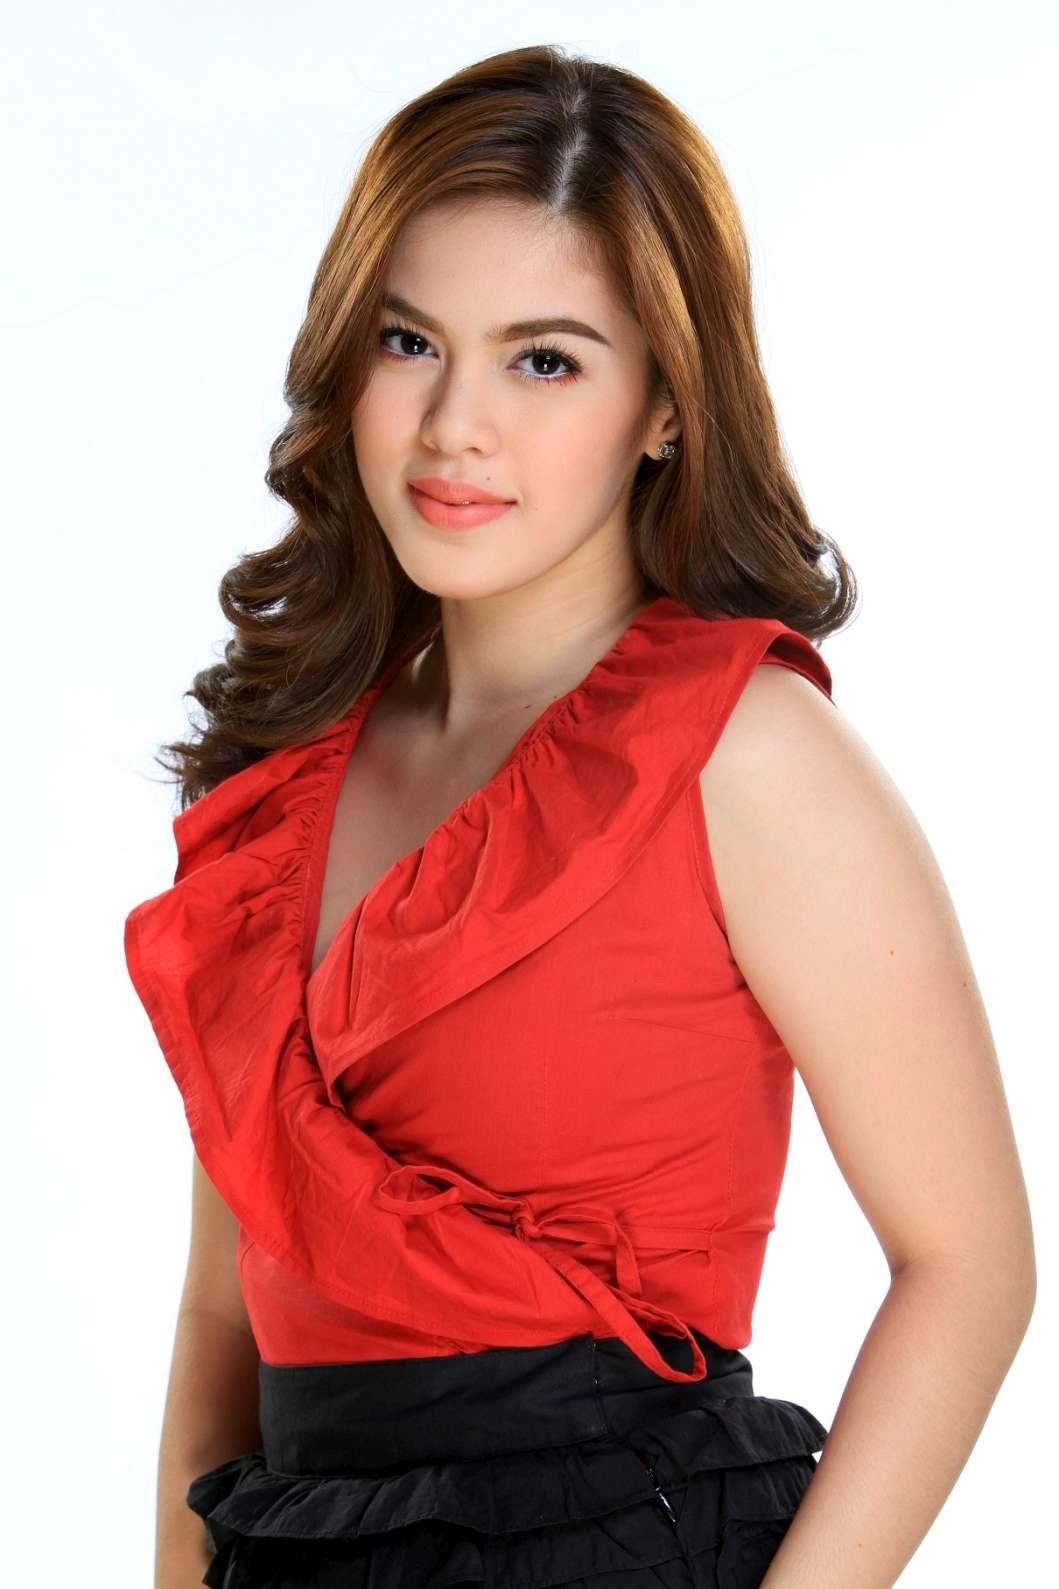 Philippines models gallery shaina magdayao profile for Shaina model